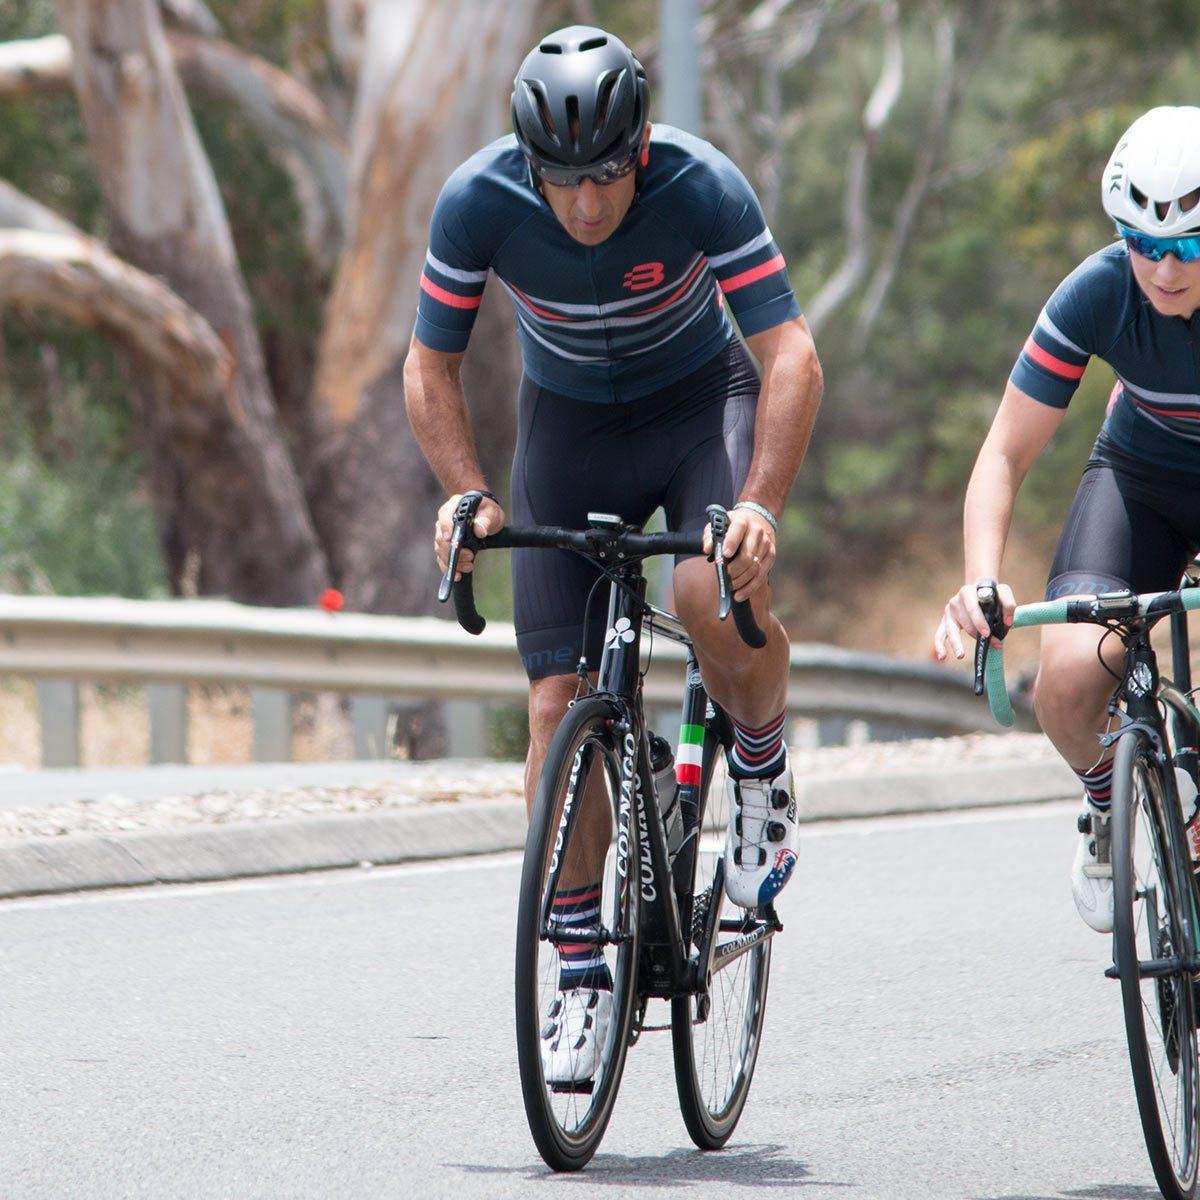 ... Mens Rails v2.0 Pro Fit - Cycling Jersey  1 - VL67954 - Full ... 75e2a0ffd